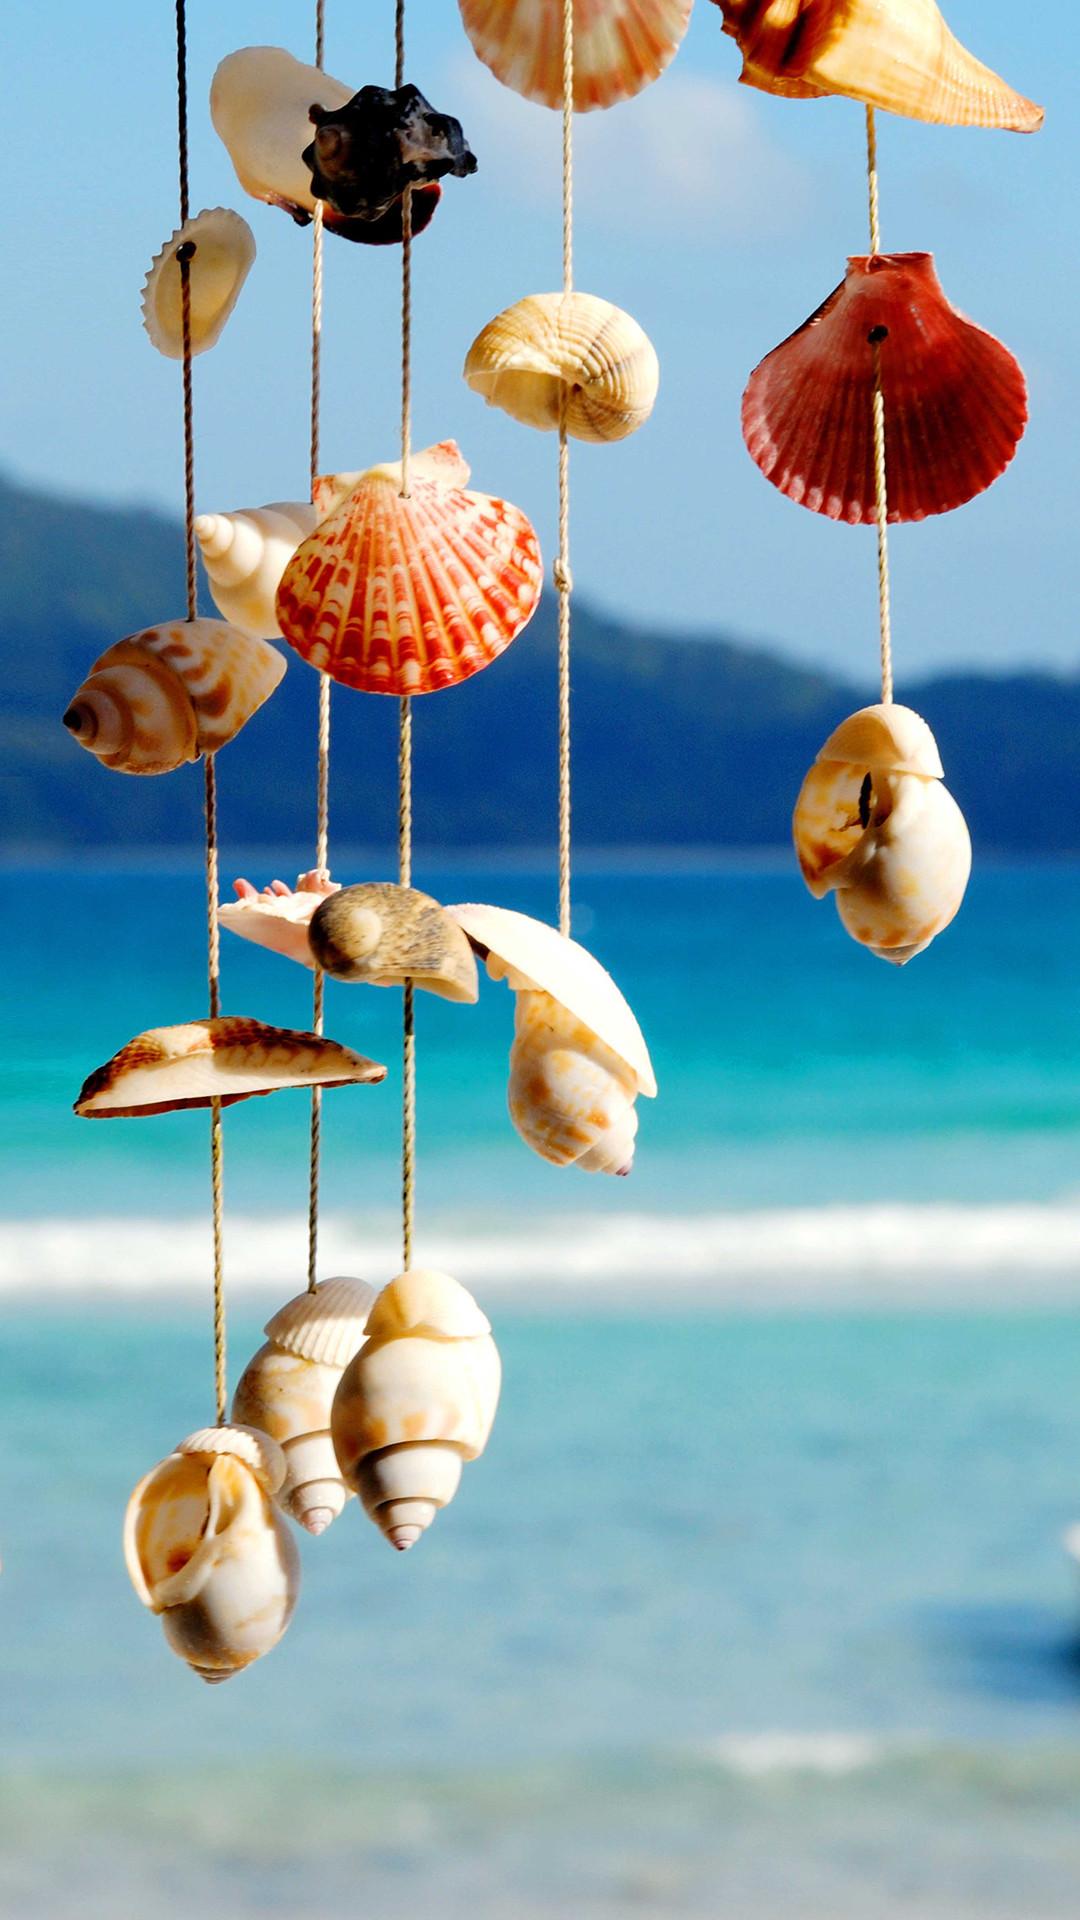 ↑↑TAP AND GET THE FREE APP! Art Creative Sea Sky Water Shells Blue. App WallpaperSummer  WallpaperIphone …